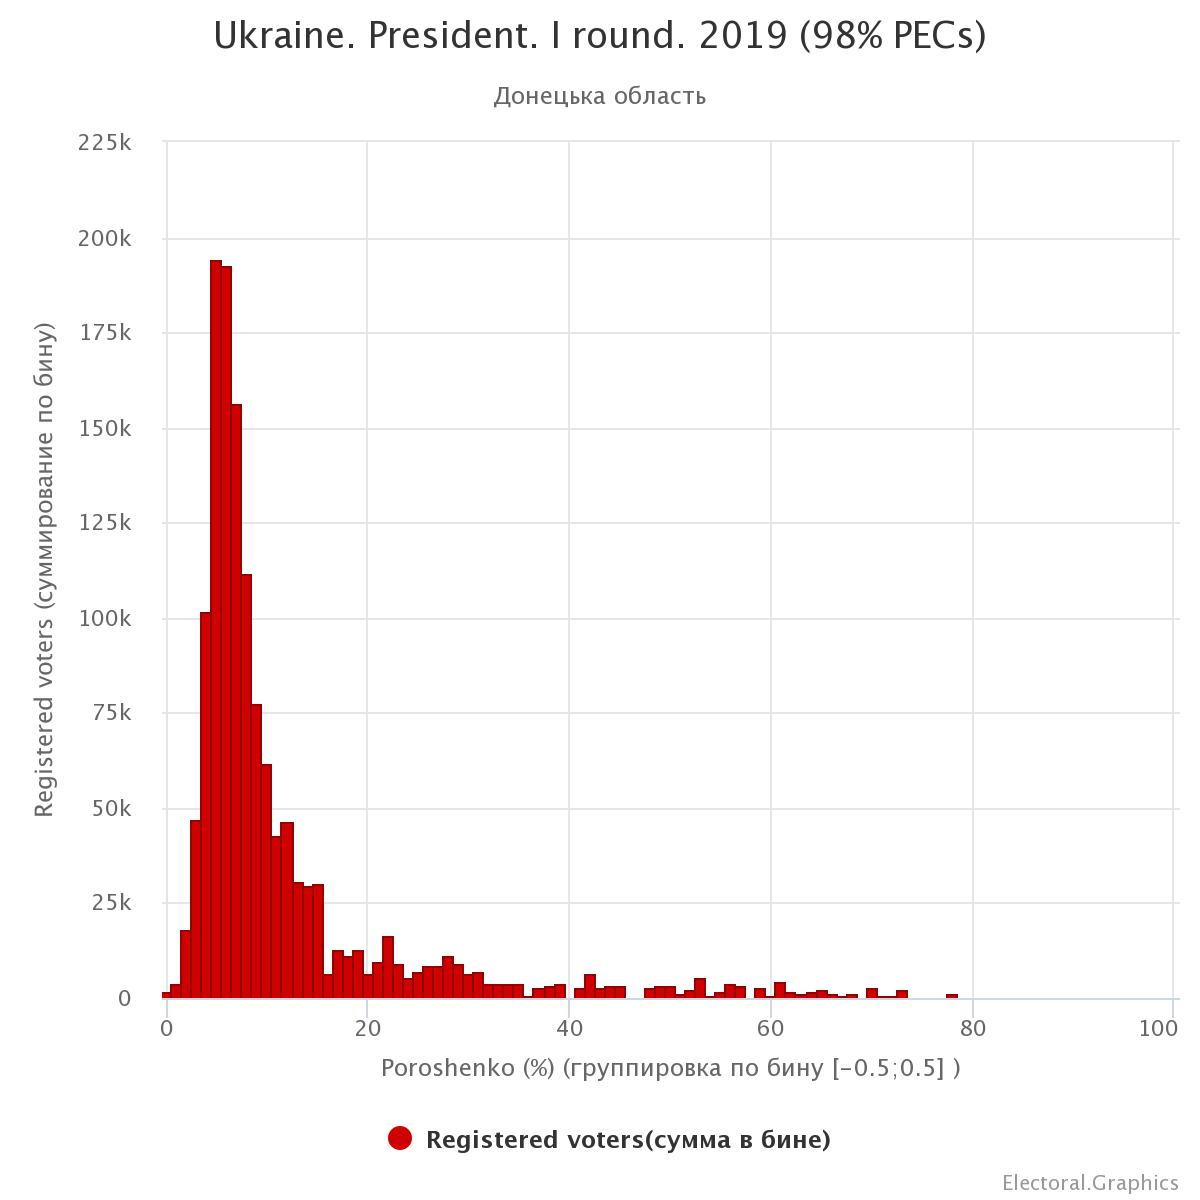 ukraine-president-i-roun (28).png